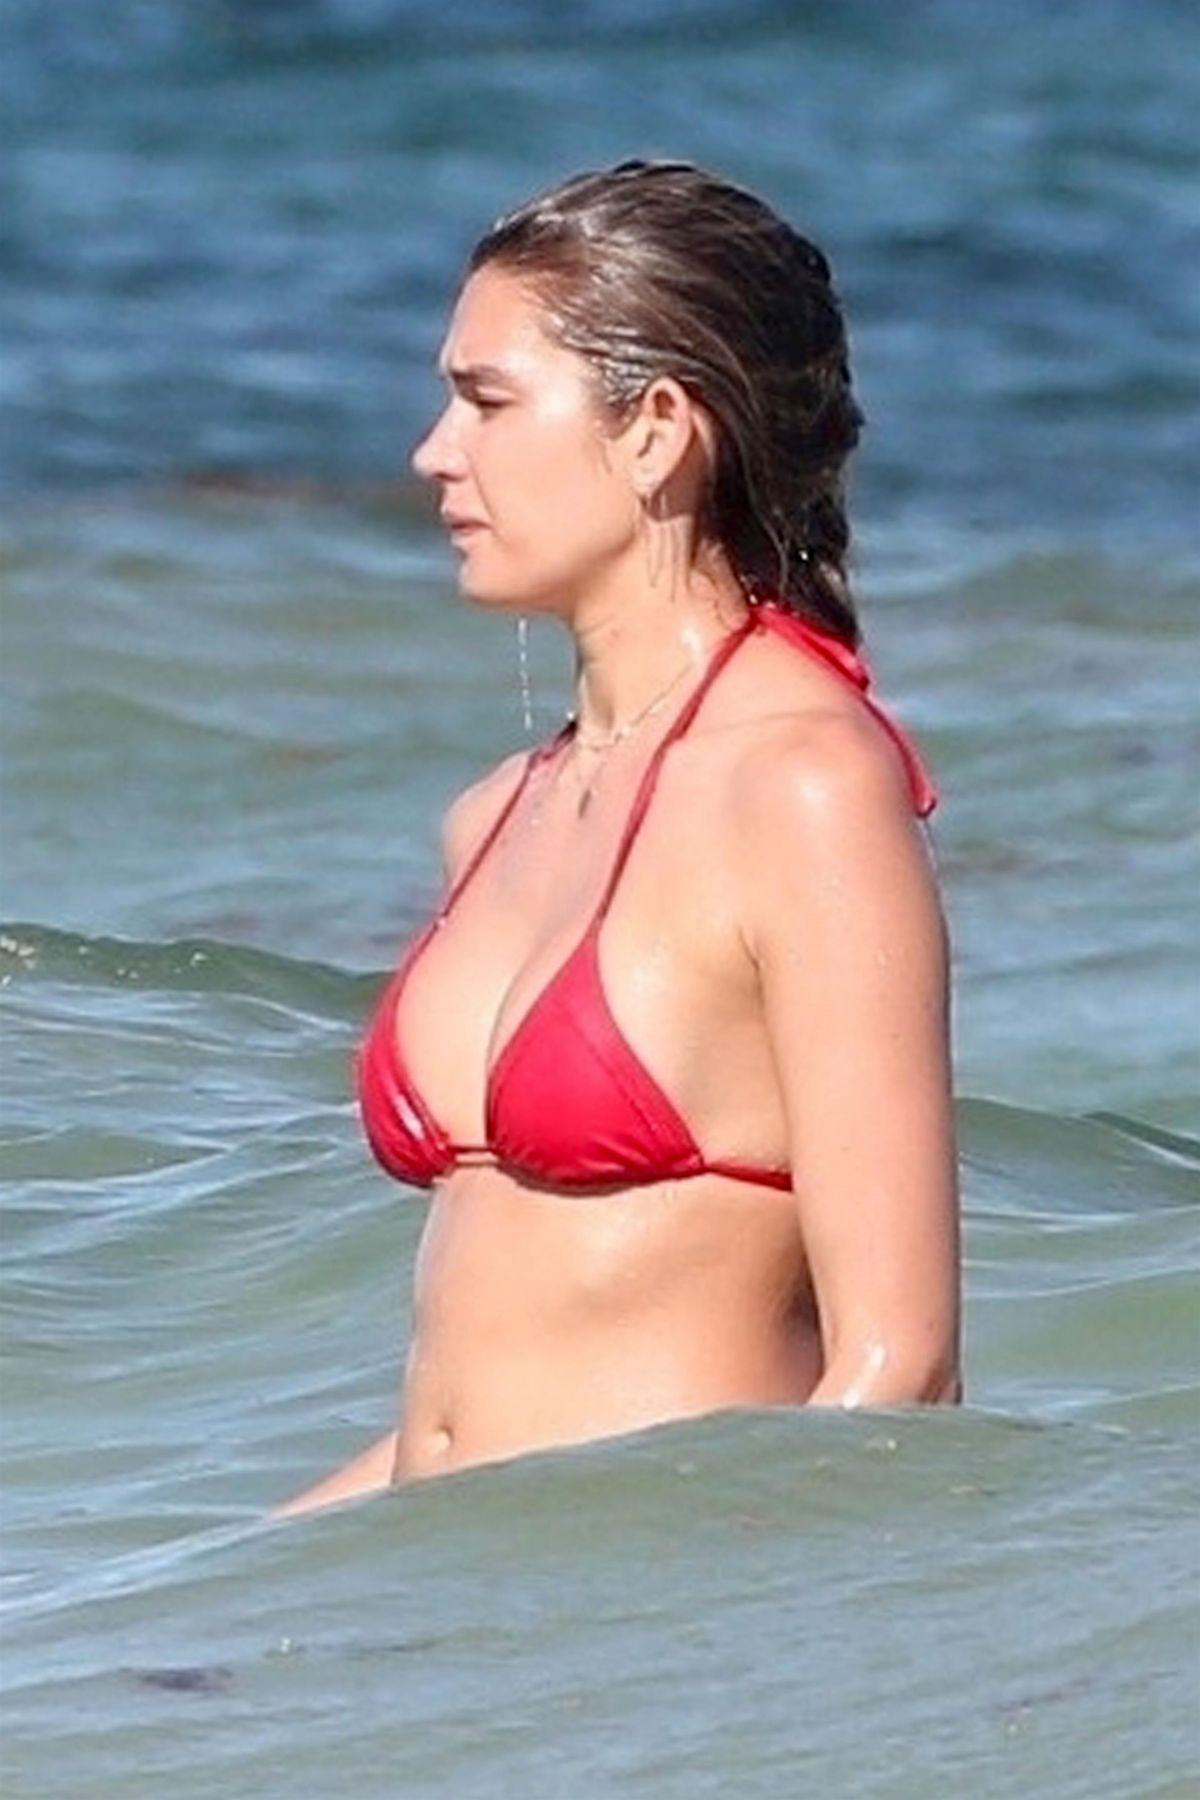 Shayna Taylor in Bikini at the beach in Tulum Pic 2 of 35